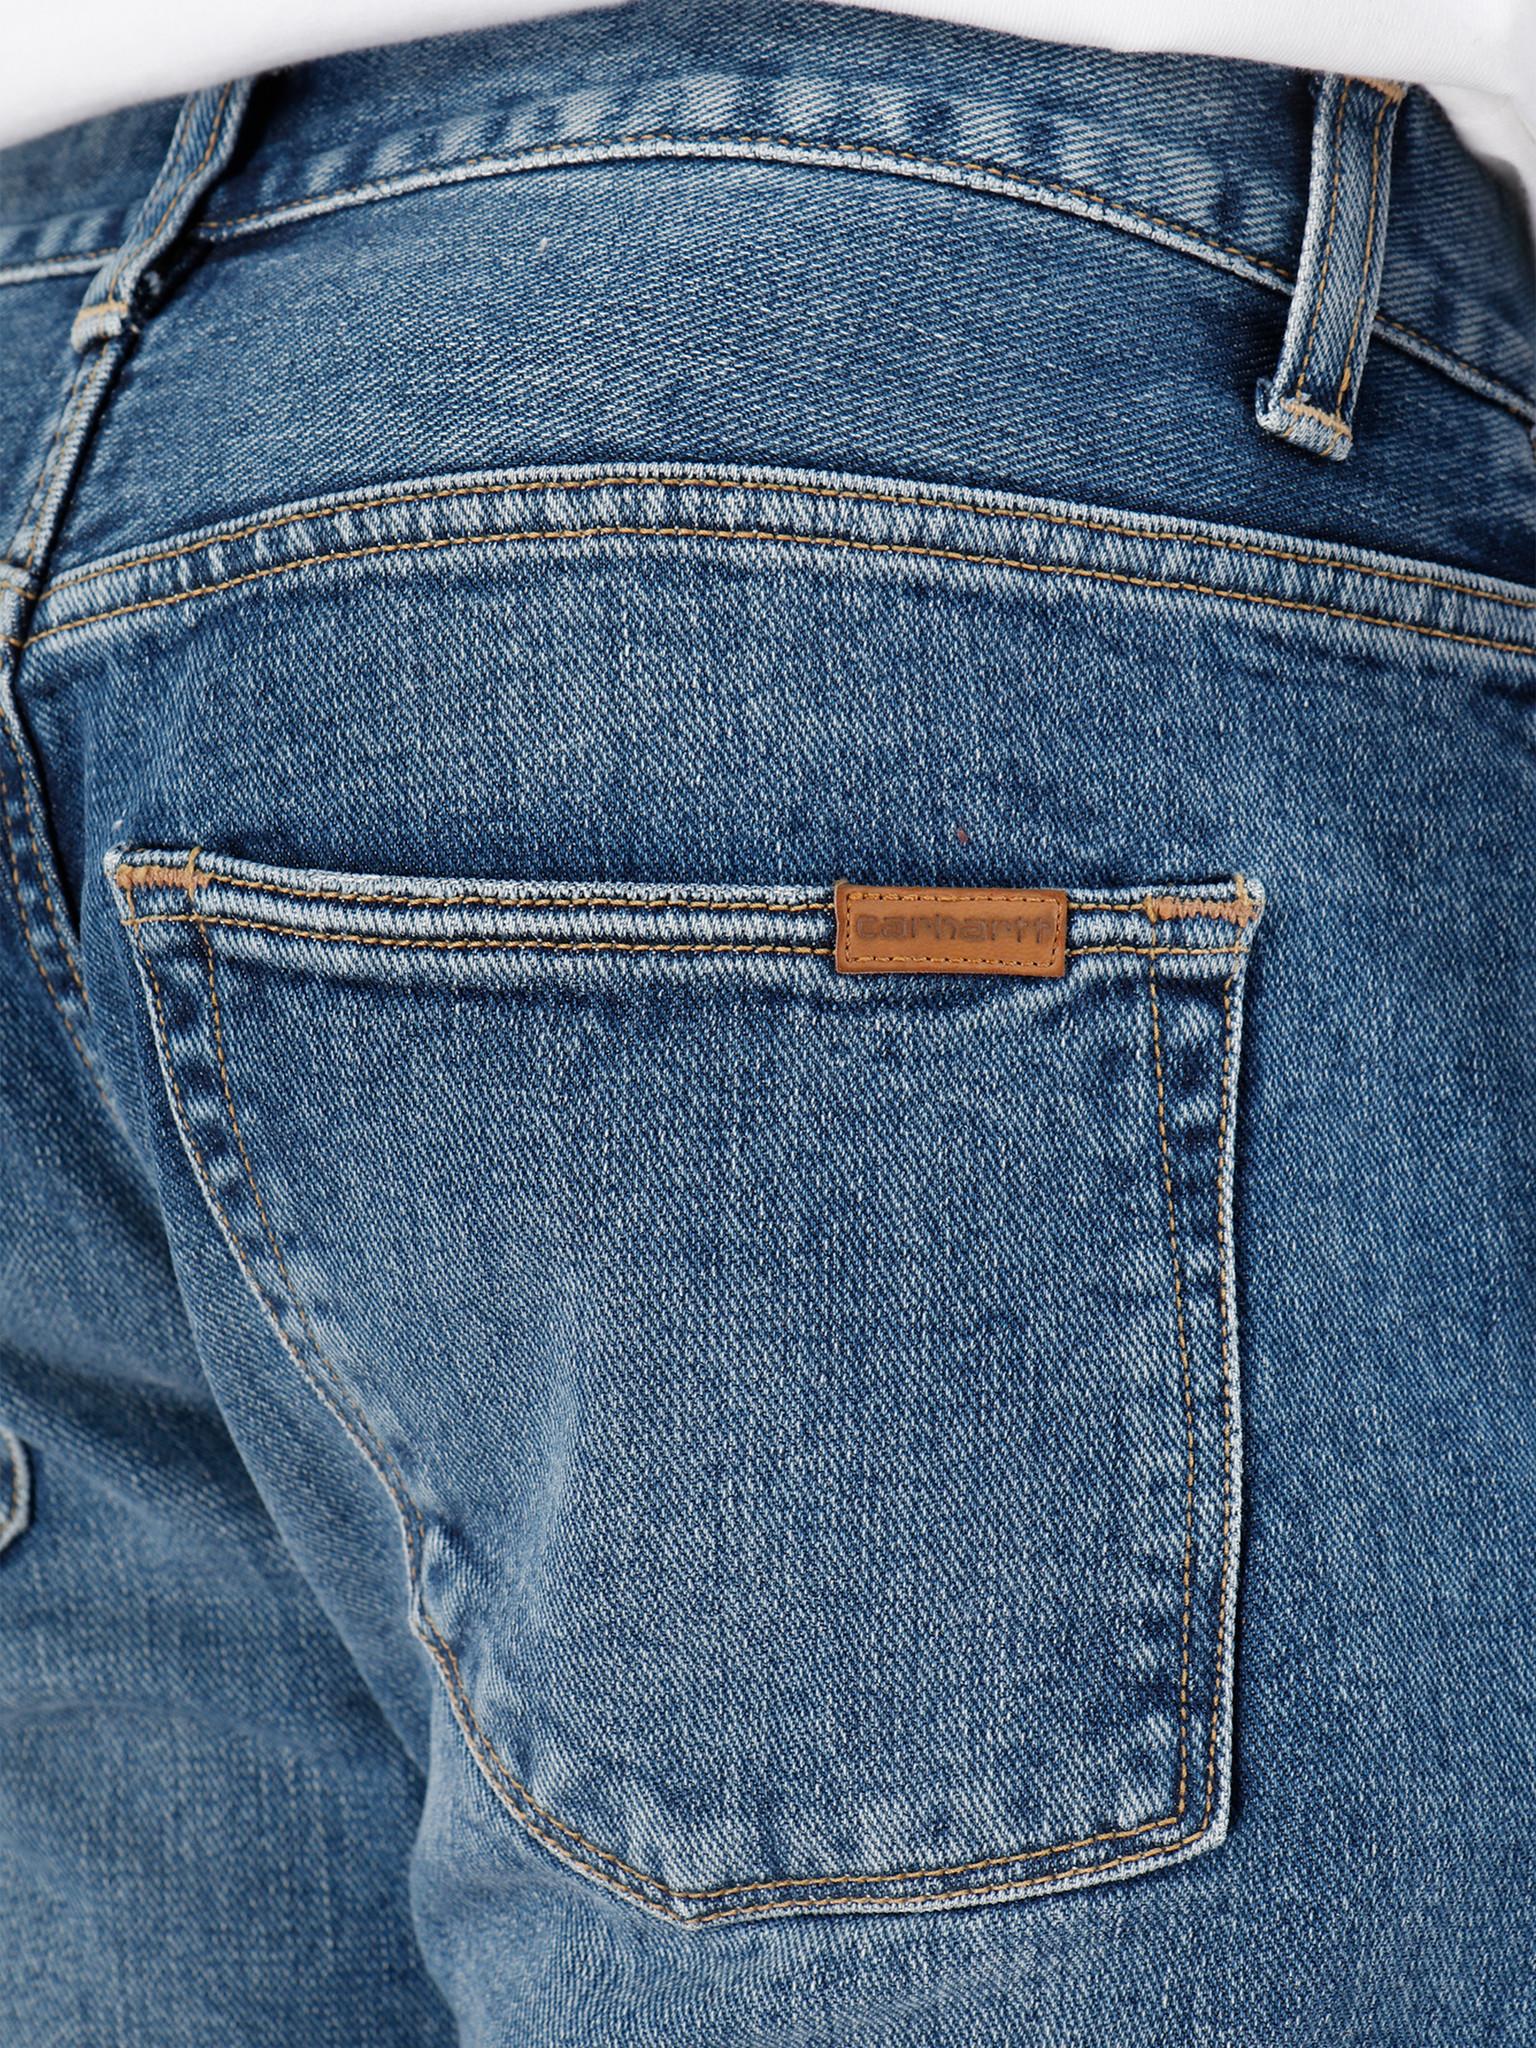 Carhartt WIP Carhartt WIP Vicious Pant Blue Mid Worn Wash I027230-01WM